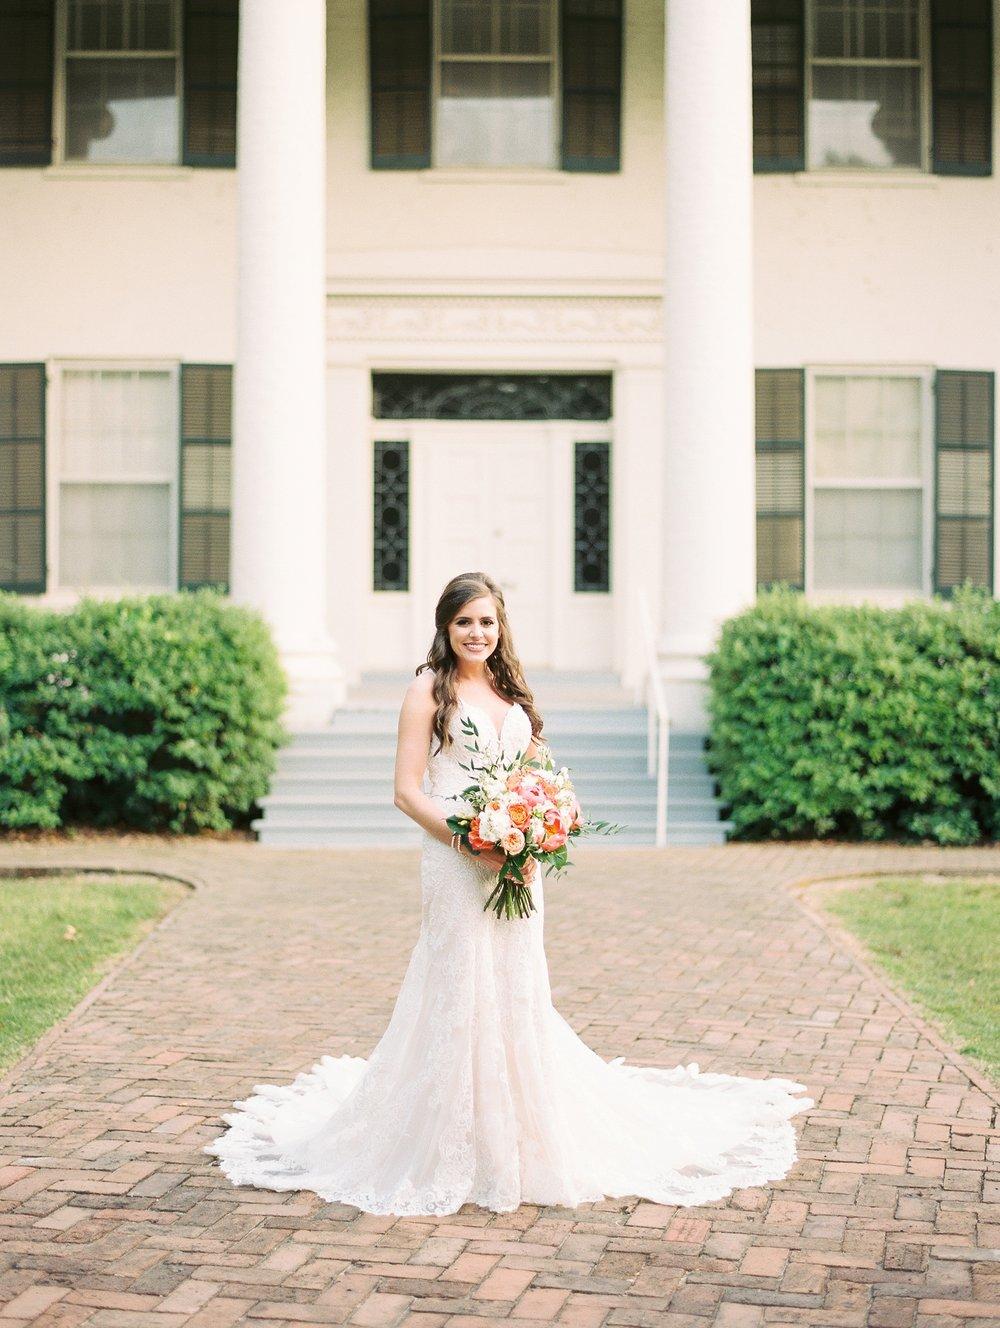 The-Terry-House-Wedding-Little-Rock-Arkansas_0082.jpg